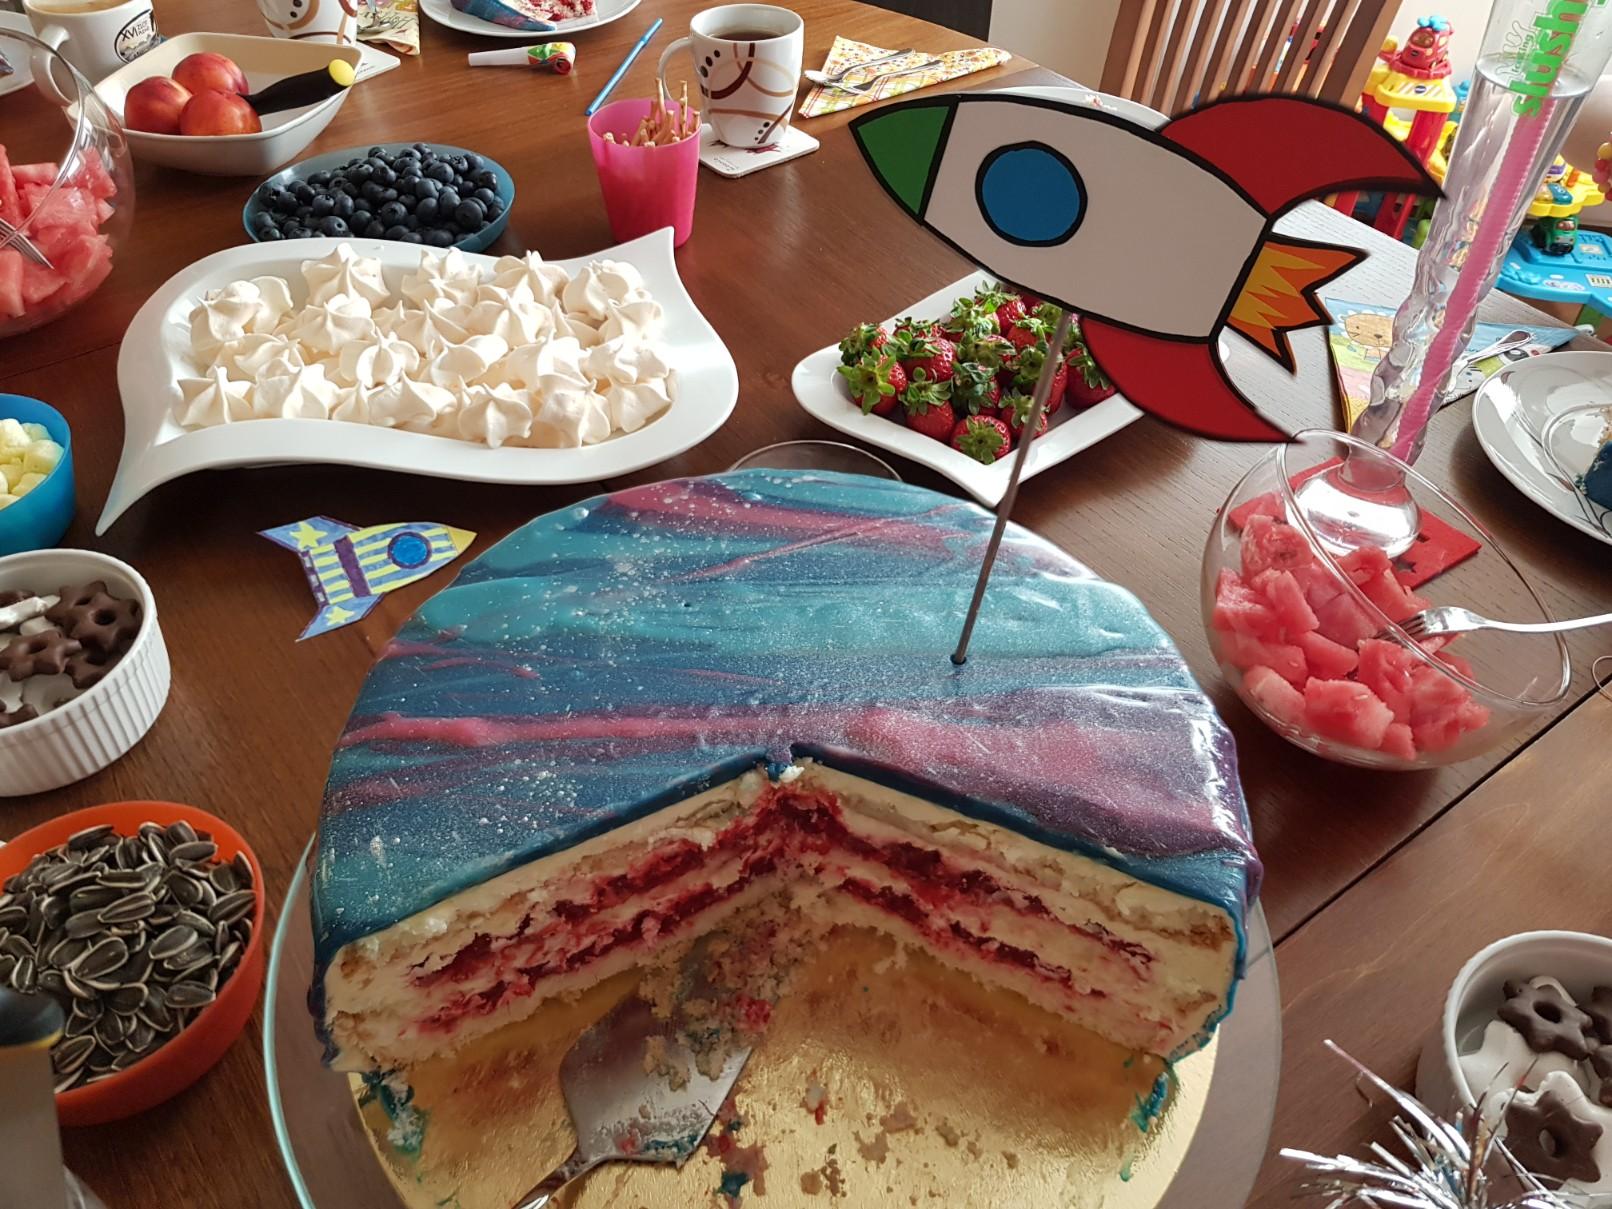 space birthday cake open